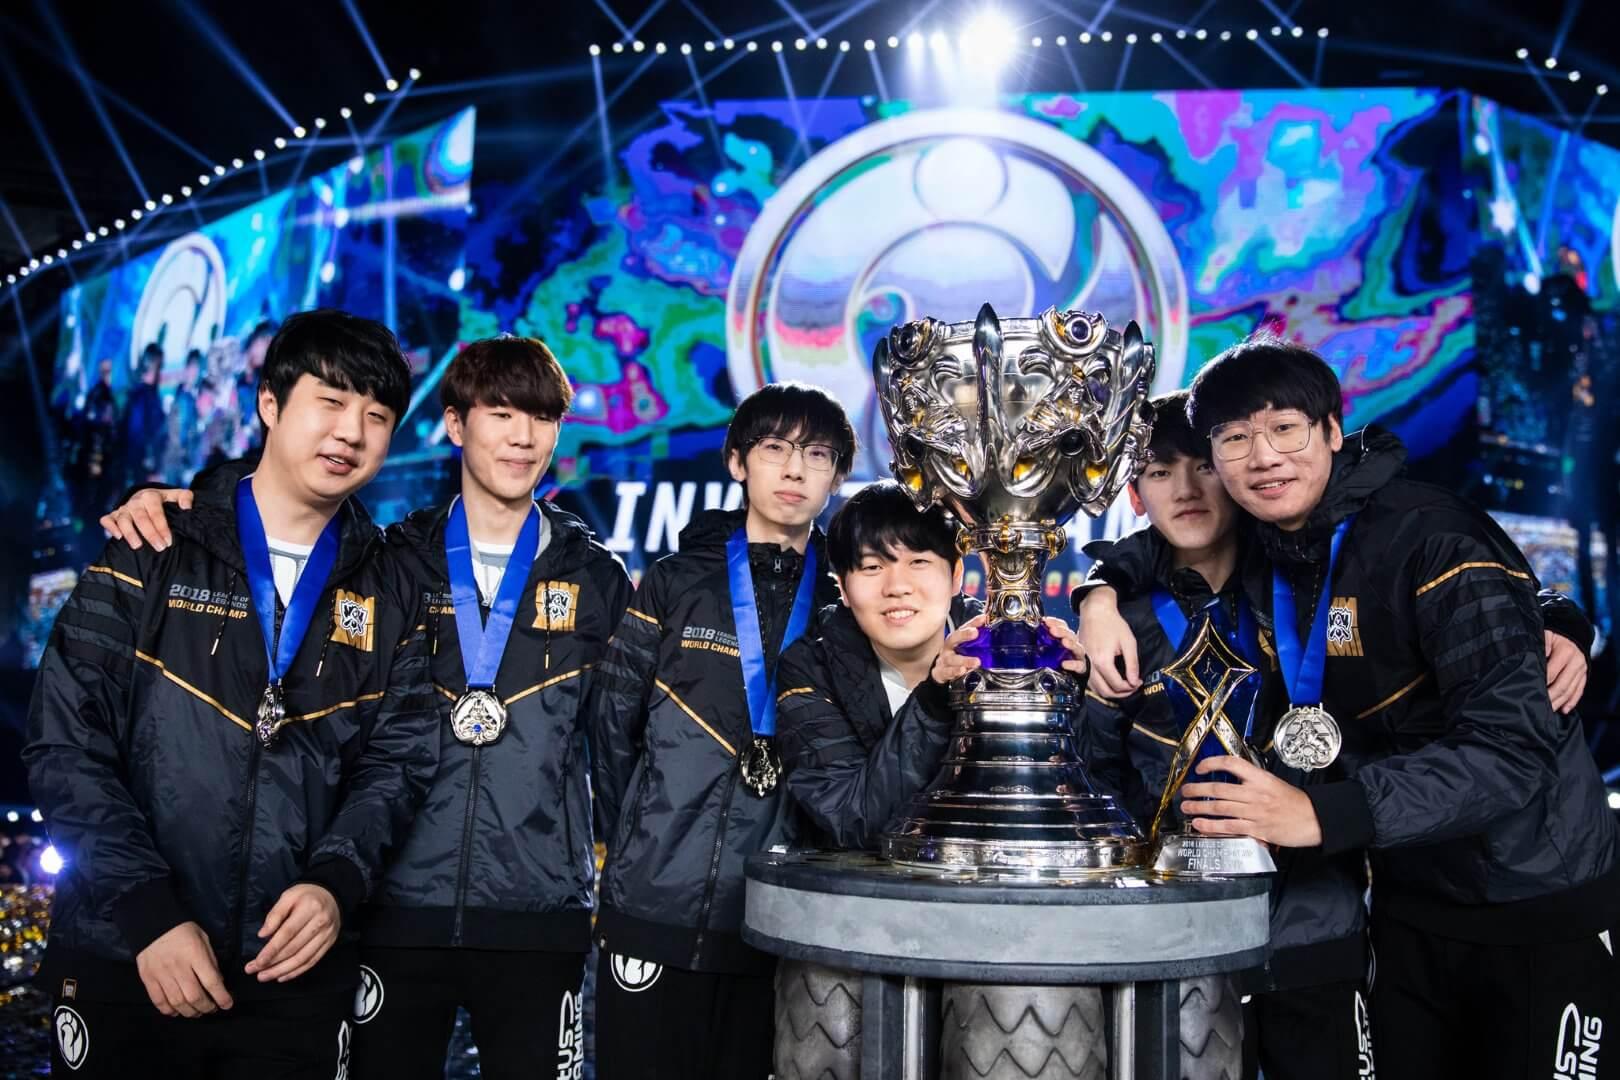 Invictus Gaming won $2,418,750 at 2018 World Championship